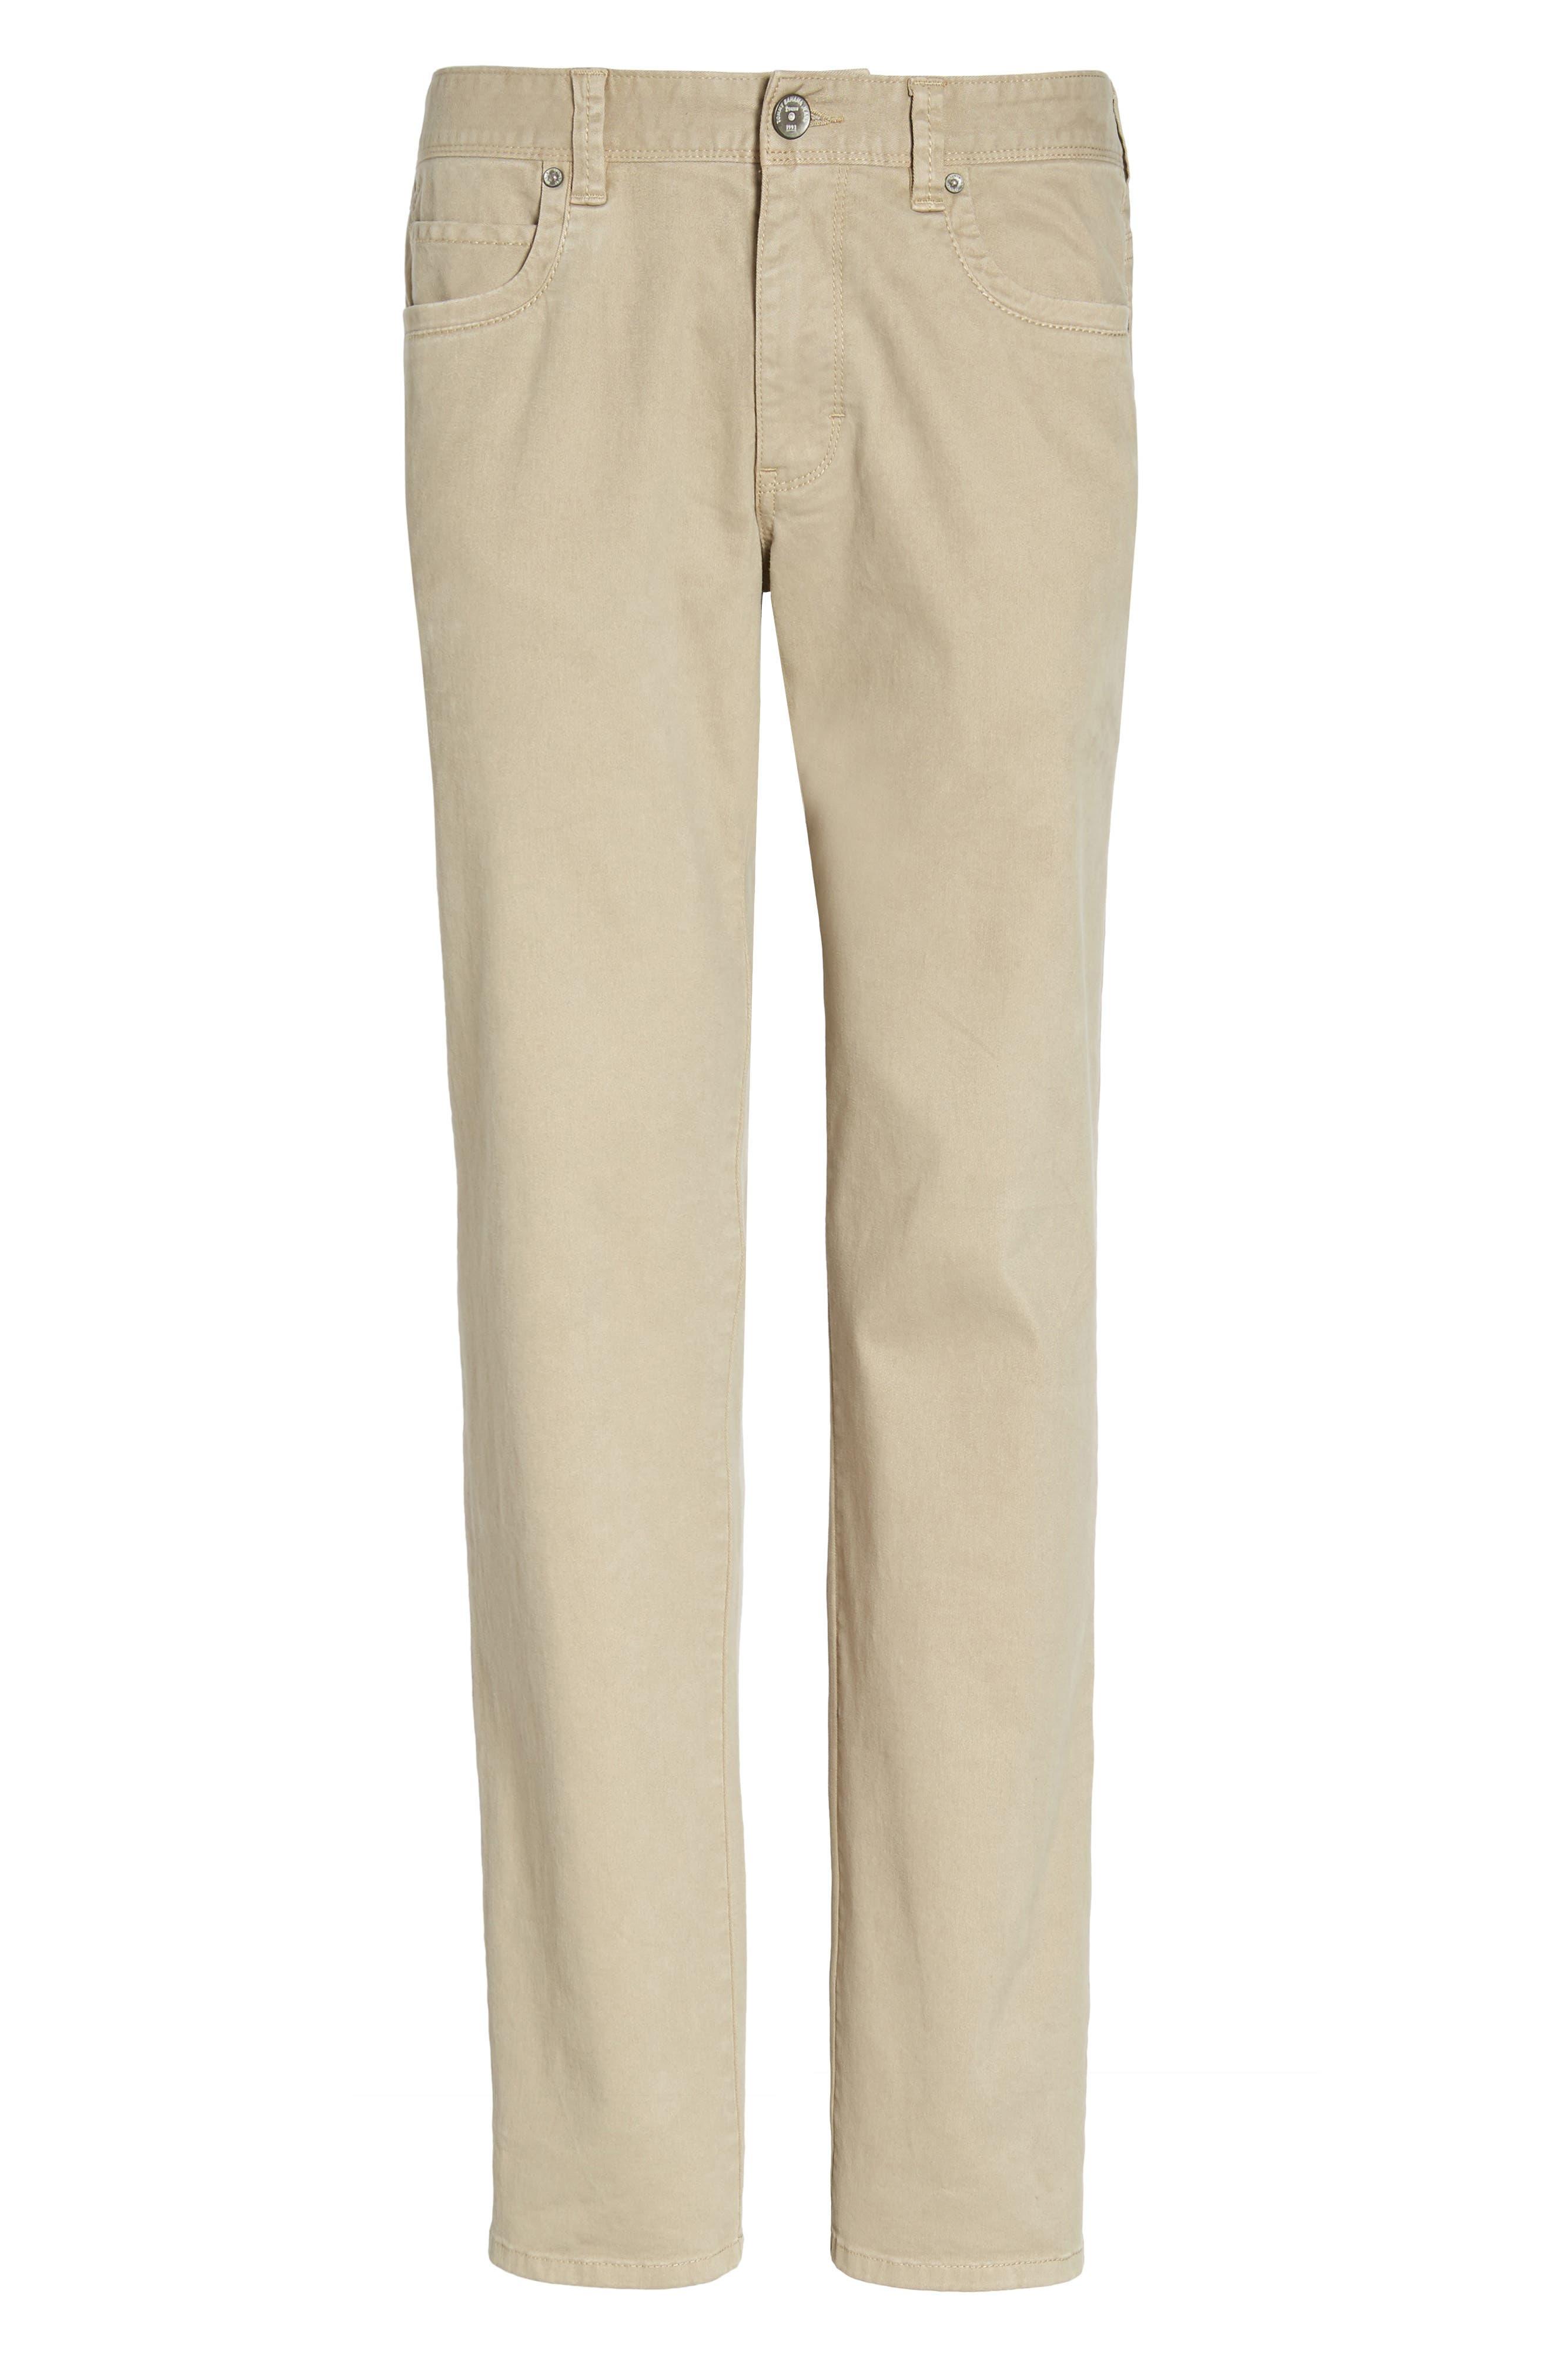 Boracay Pants,                             Alternate thumbnail 6, color,                             Khaki